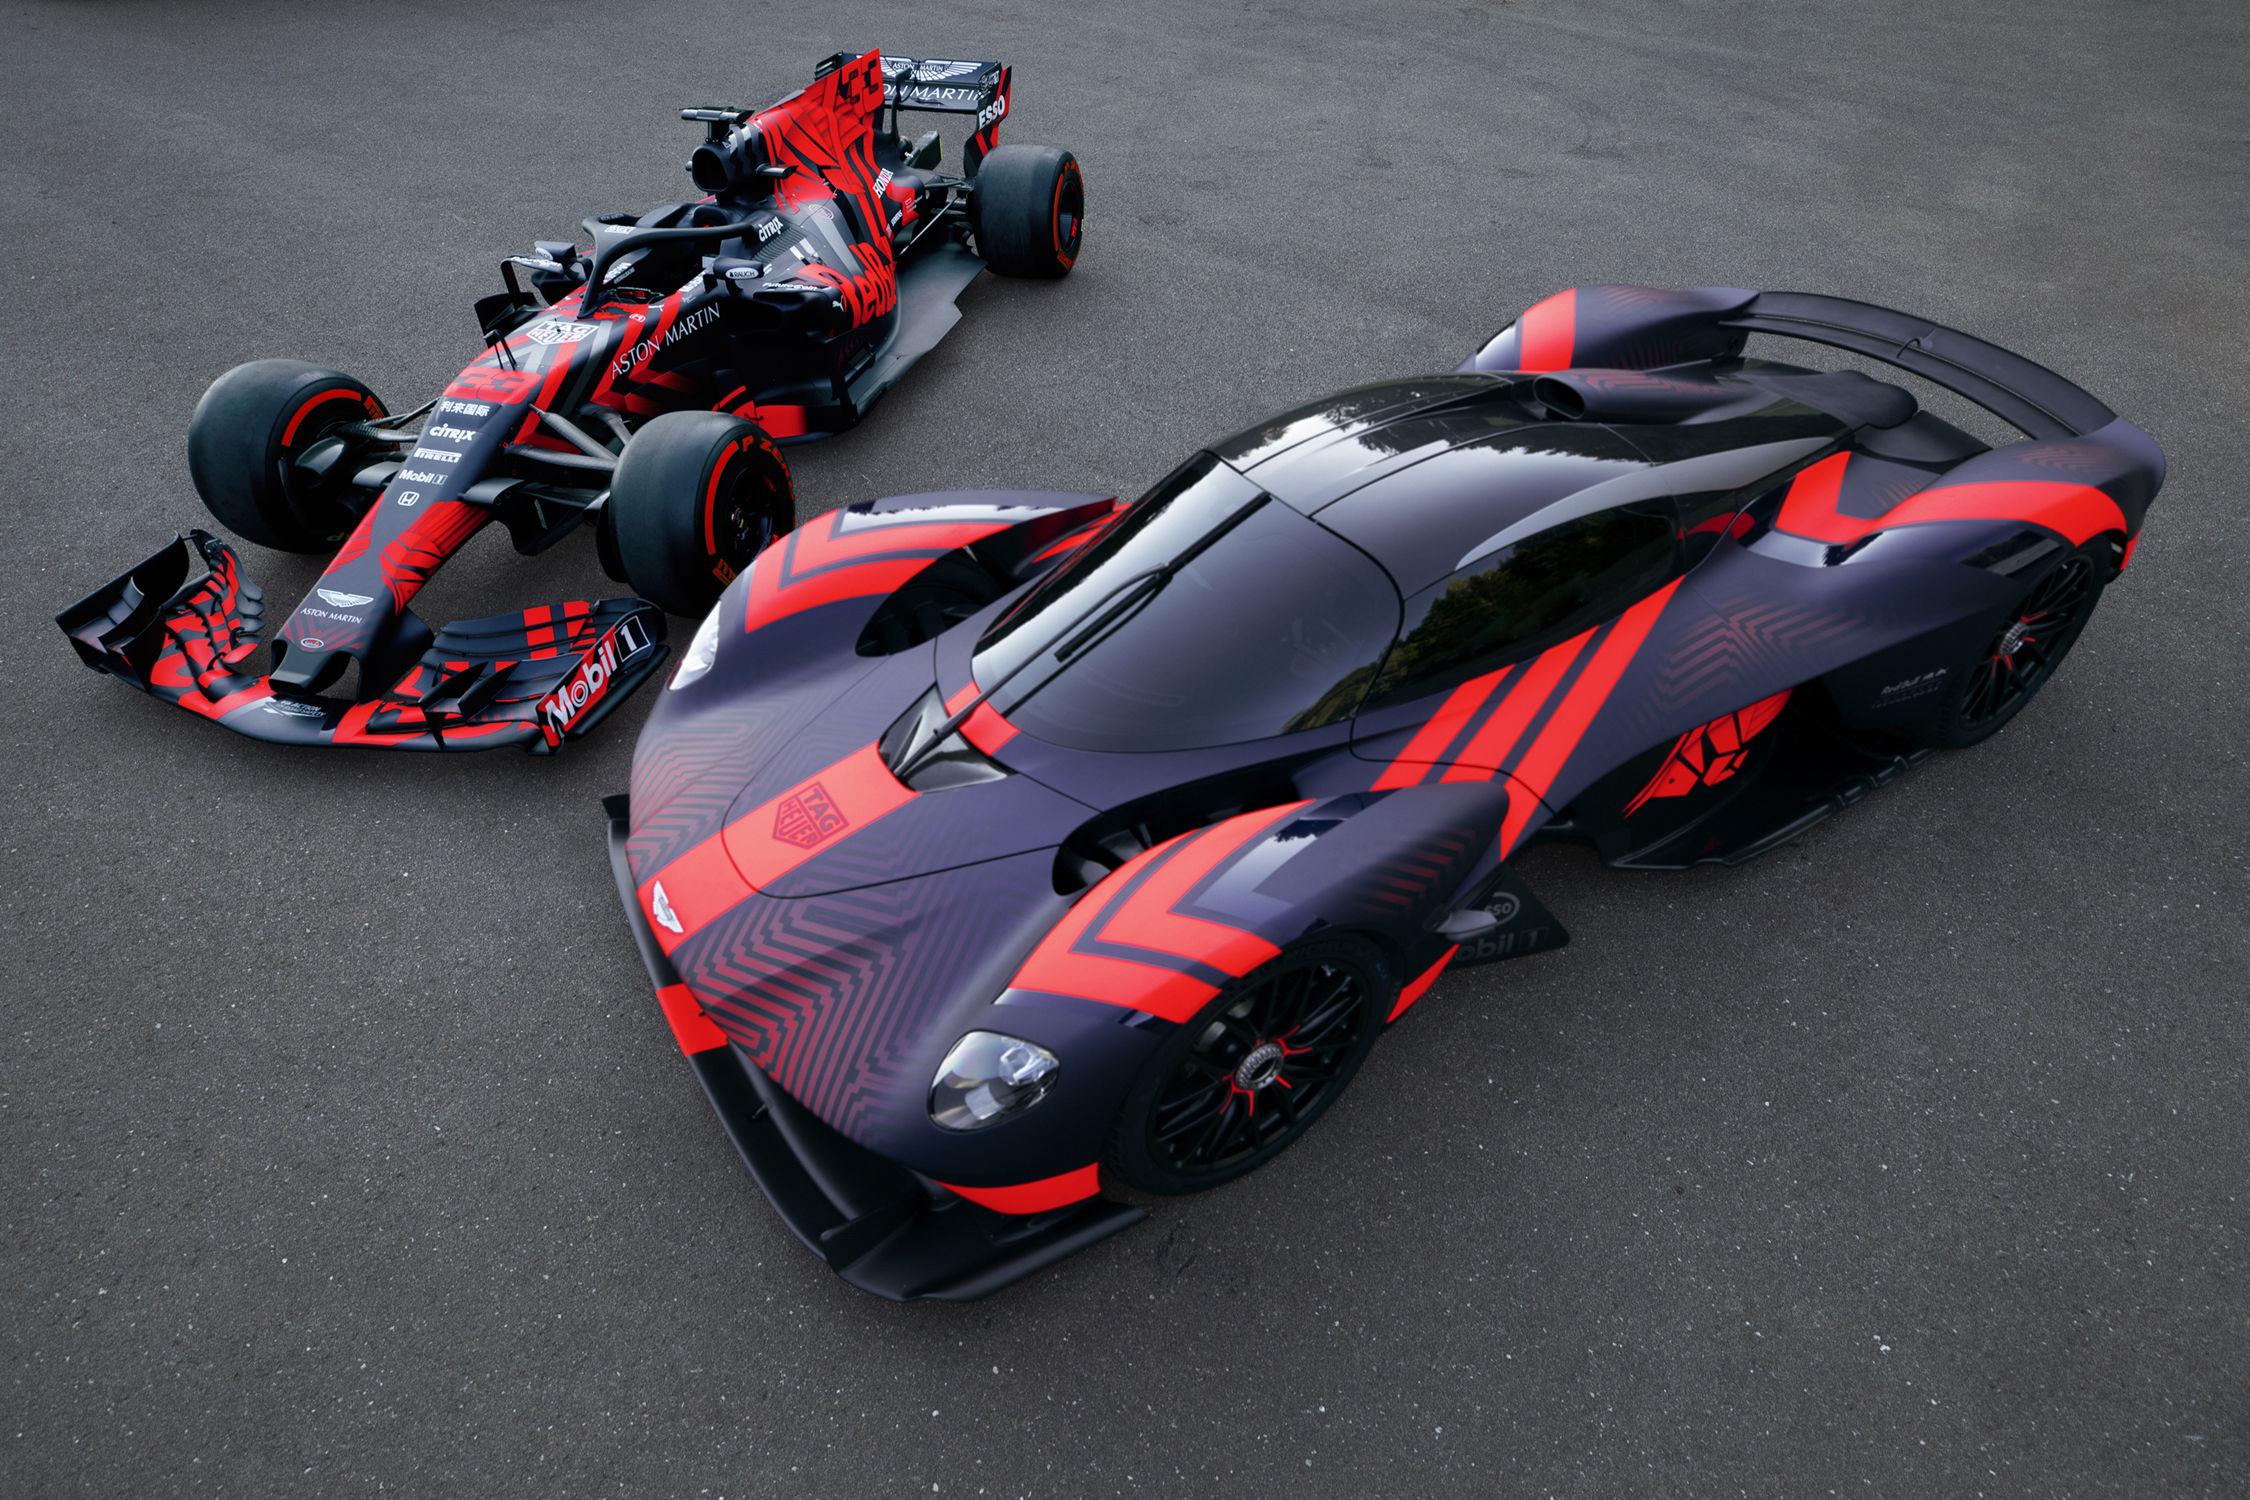 F1 : Des voitures 007 pour Red Bull à Silverstone